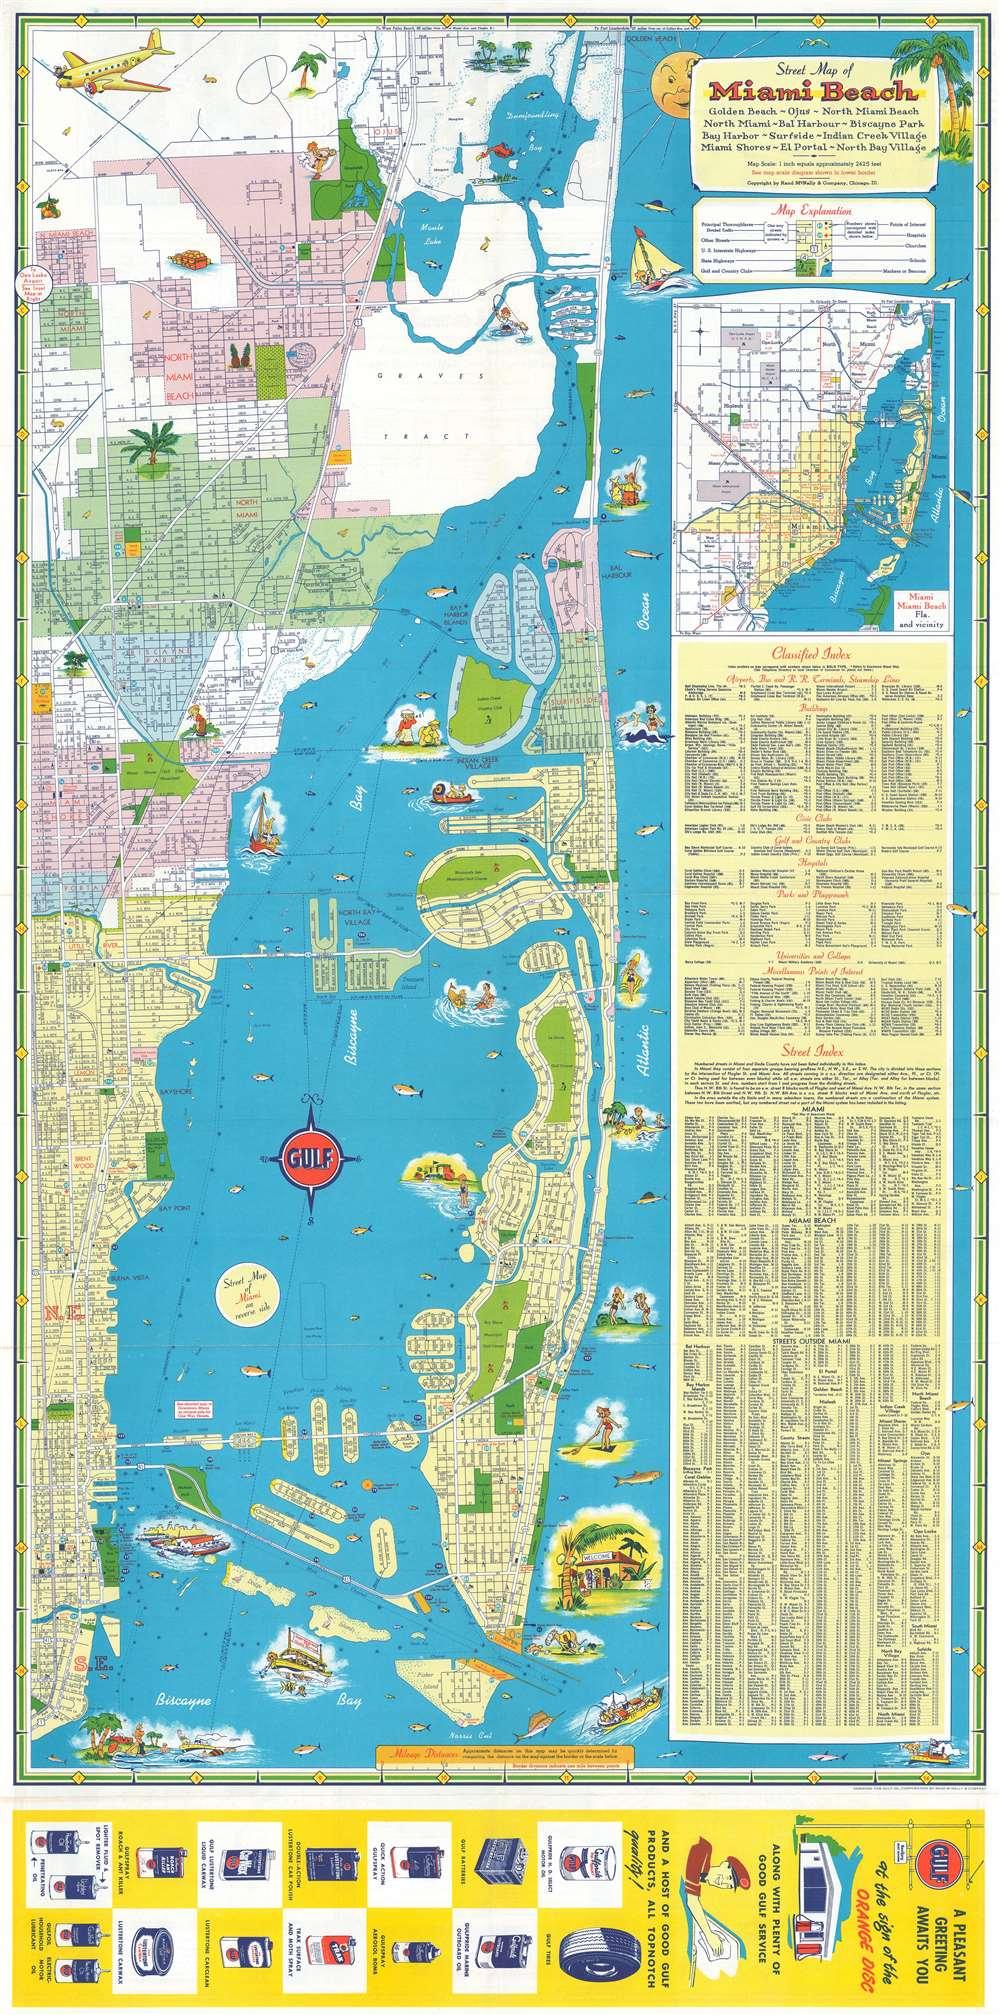 Miami Miami Beach Tourguide Map. - Main View